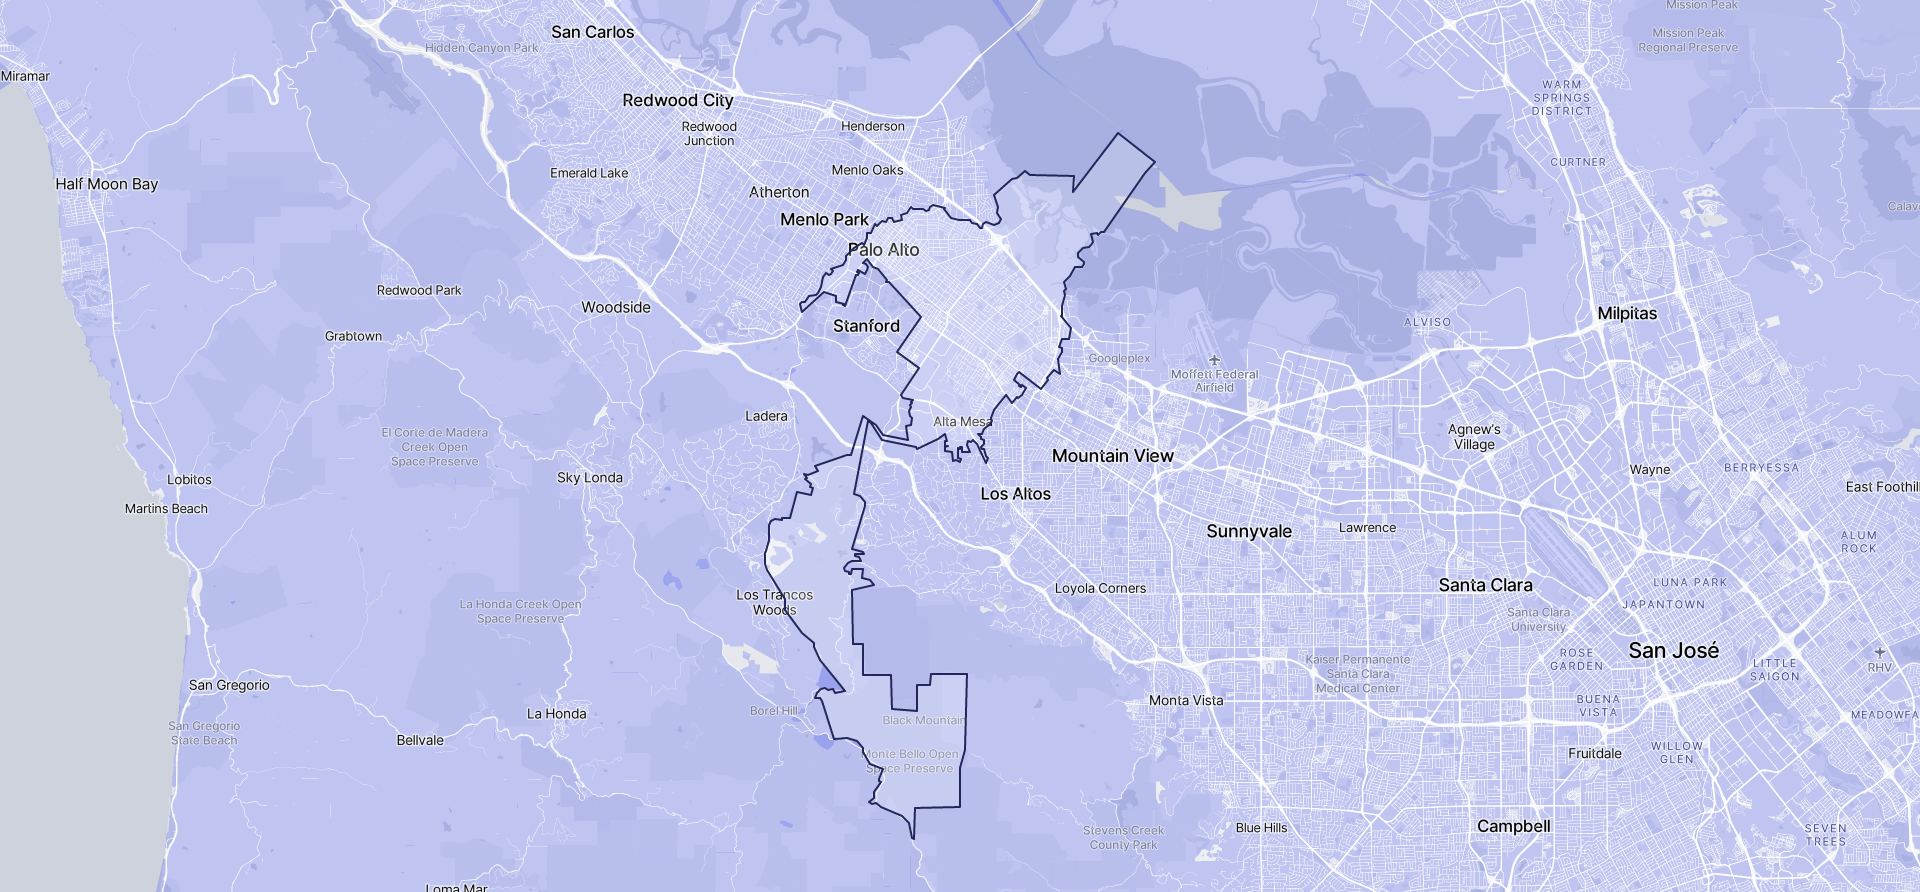 Image of Palo Alto boundaries on a map.